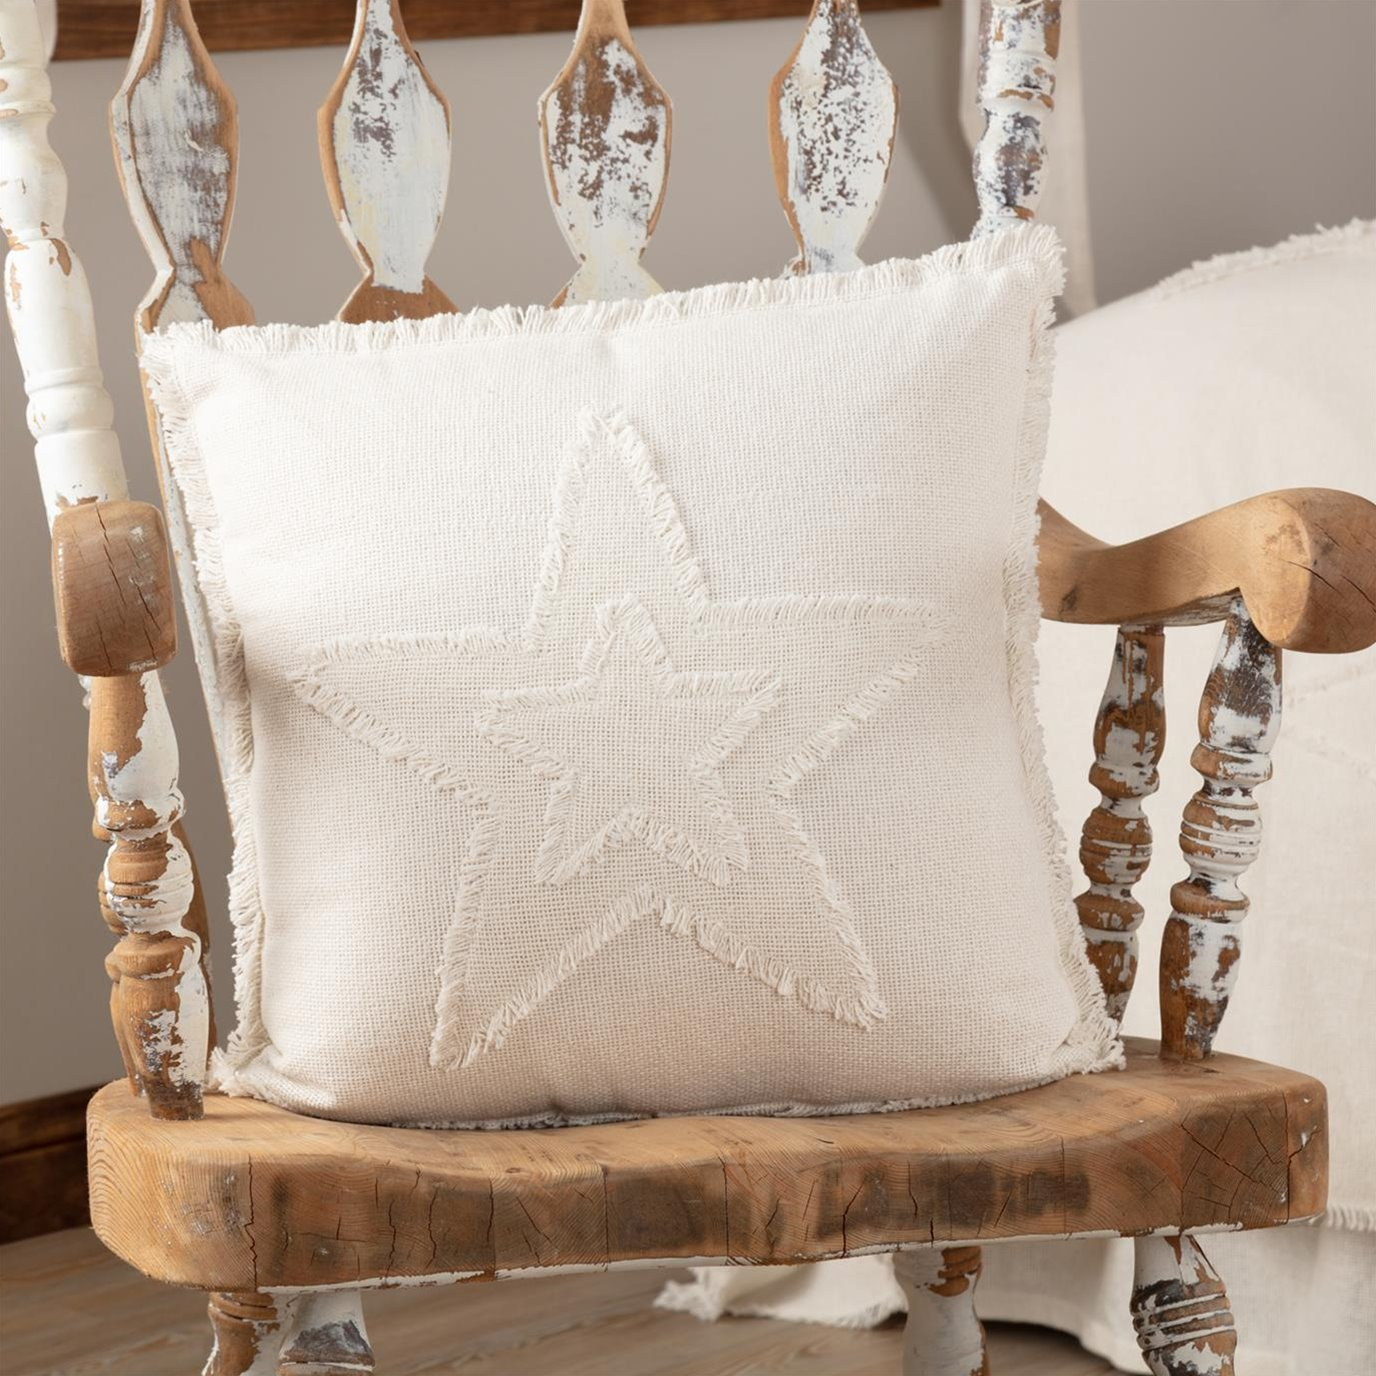 Burlap Antique White Star Pillow 18x18